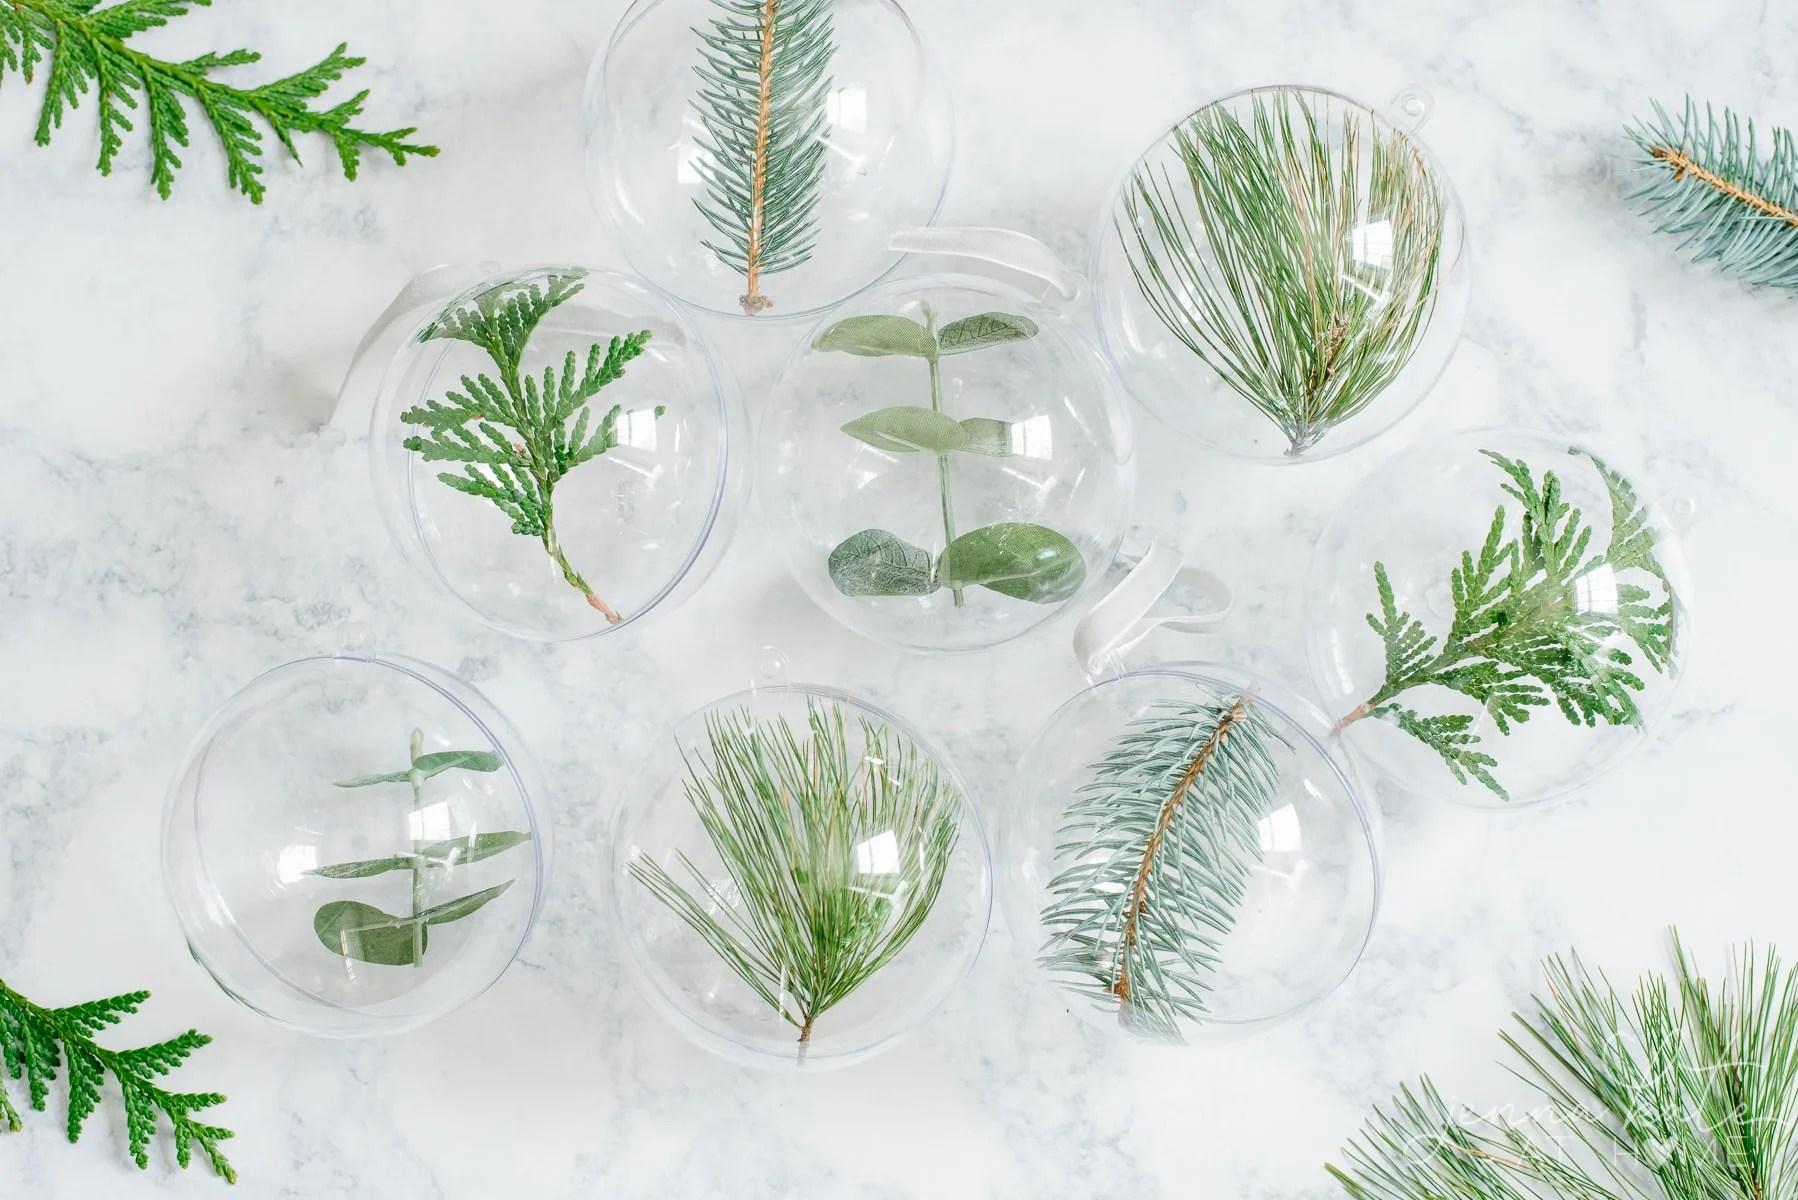 DIY minimalist Christmas tree ornaments filled with fresh greenery